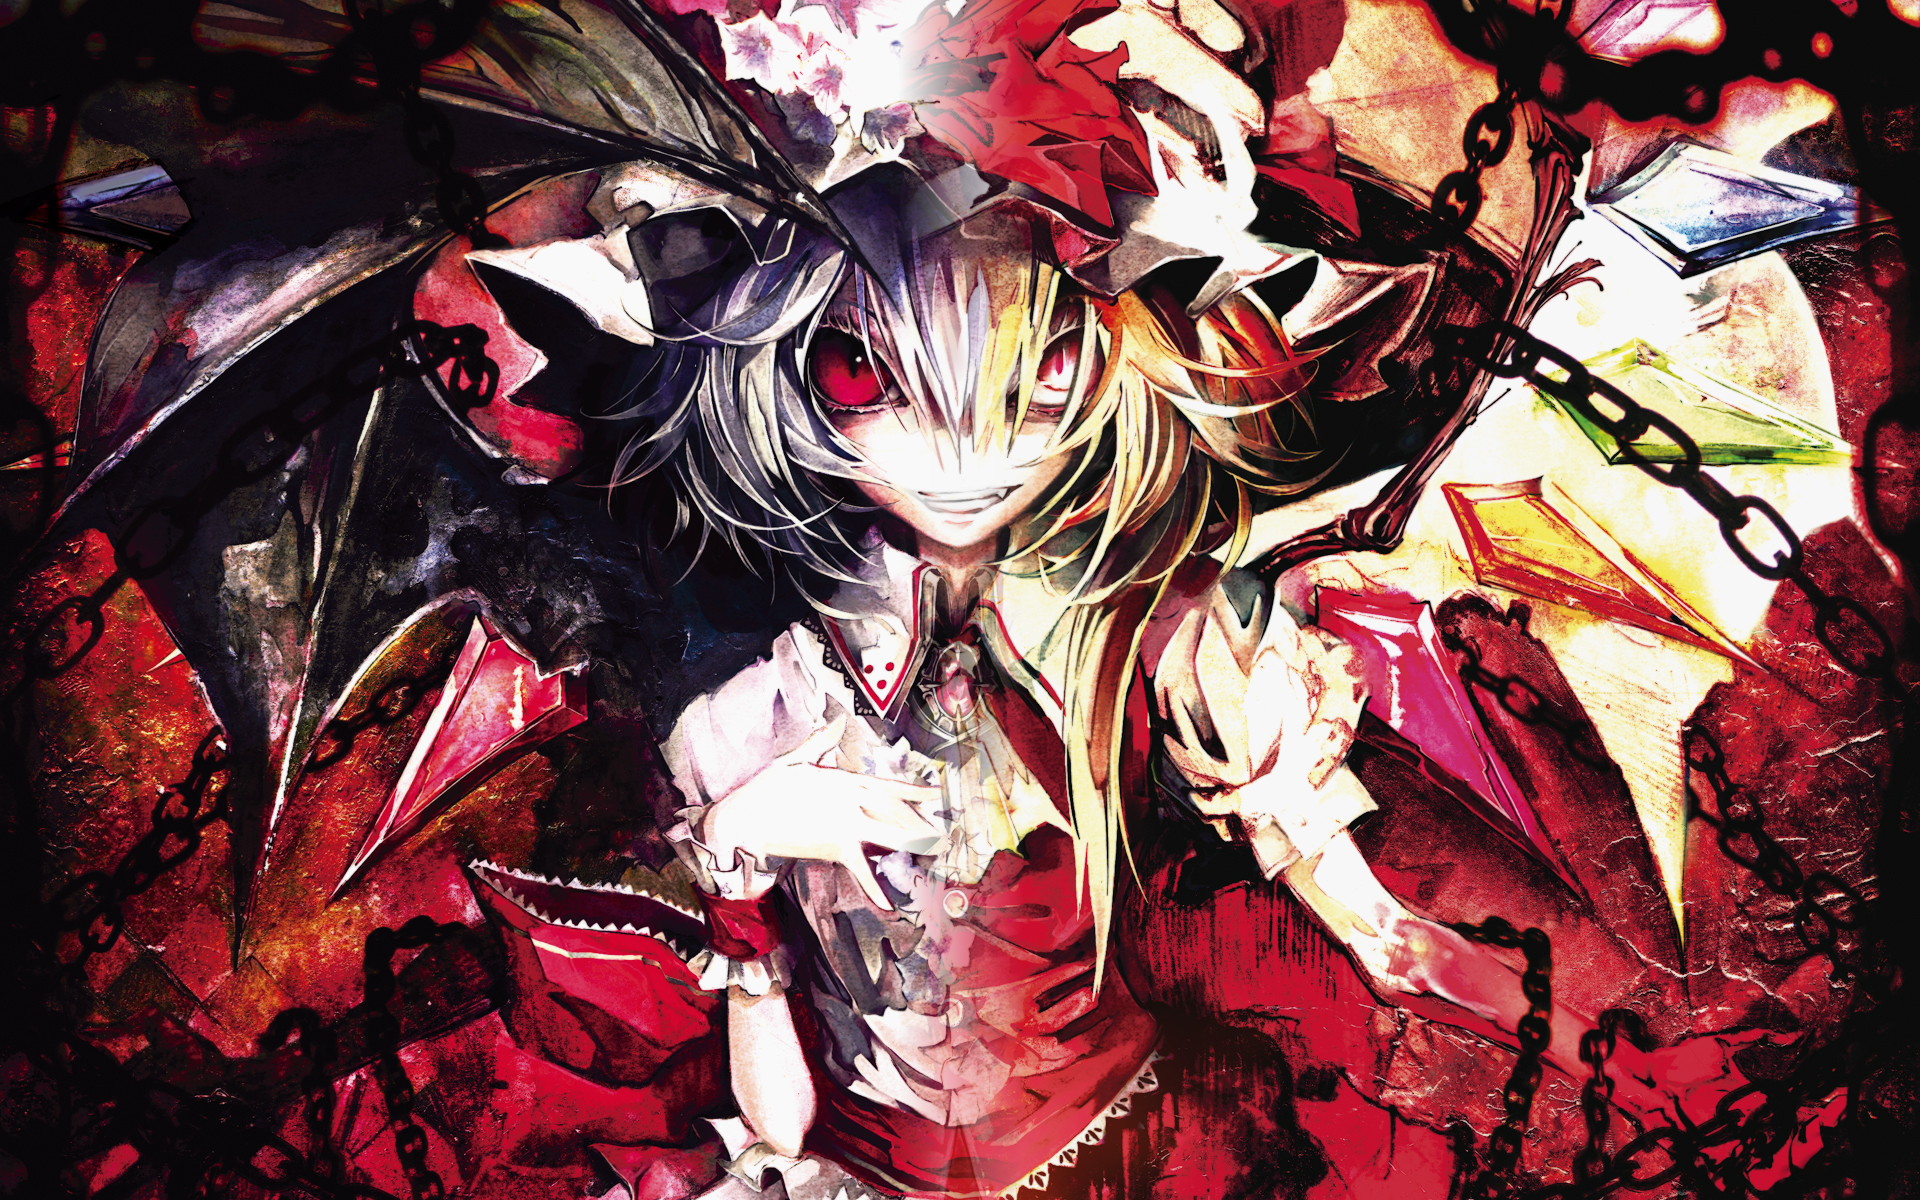 Vampire Anime Wallpaper Greenmamahk Store Magecloud Net